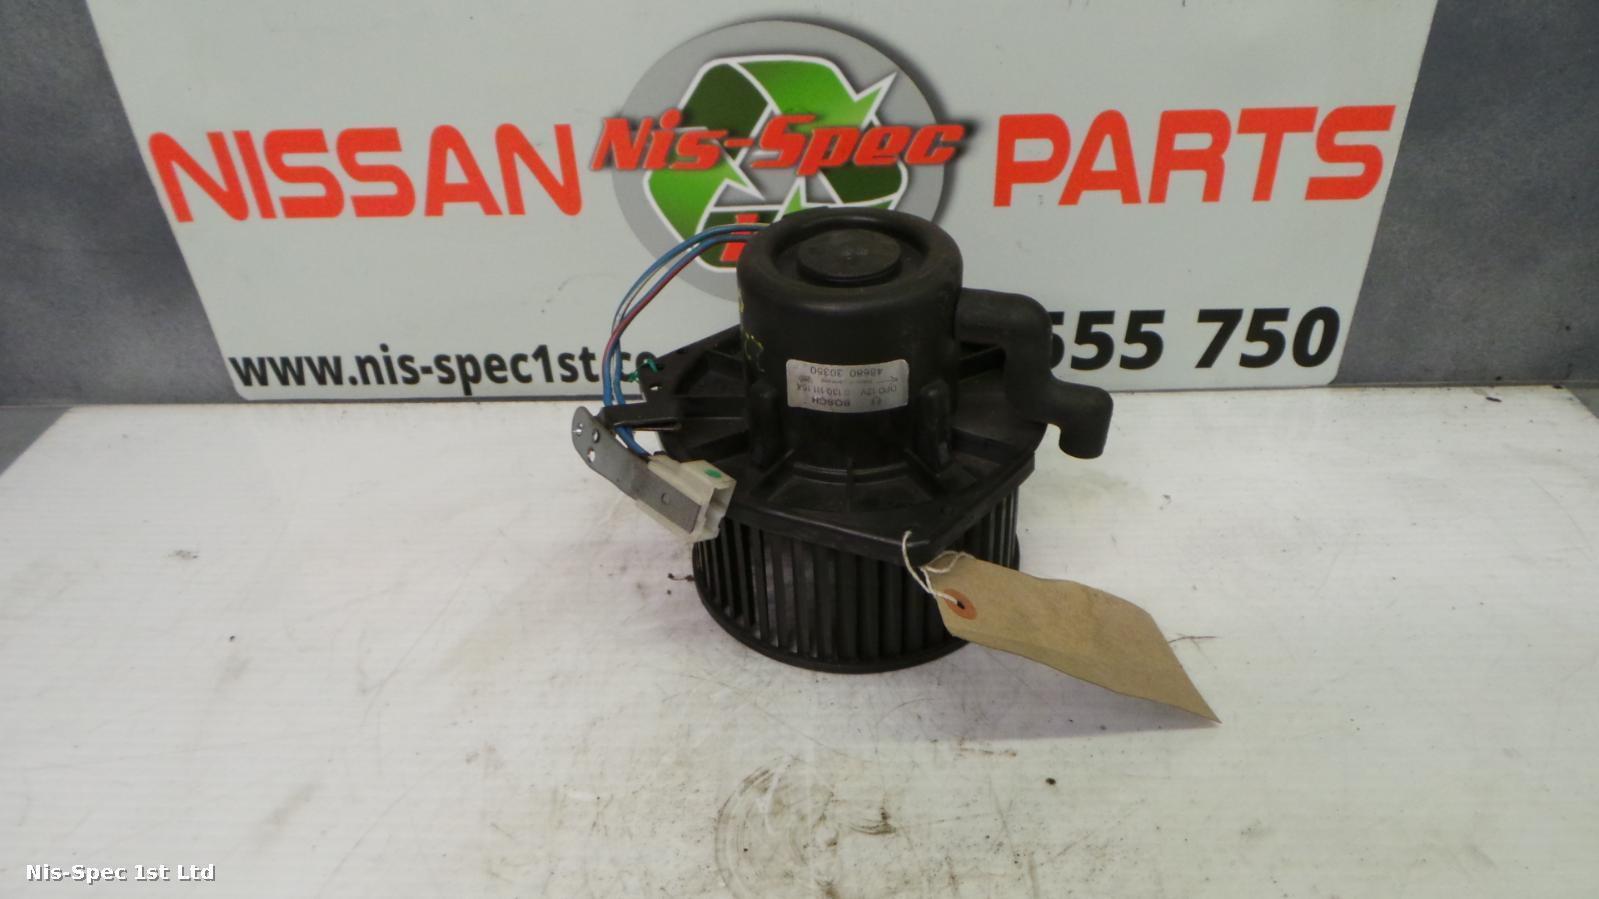 Nissan Terrano II 01 - 05 Heater Motor